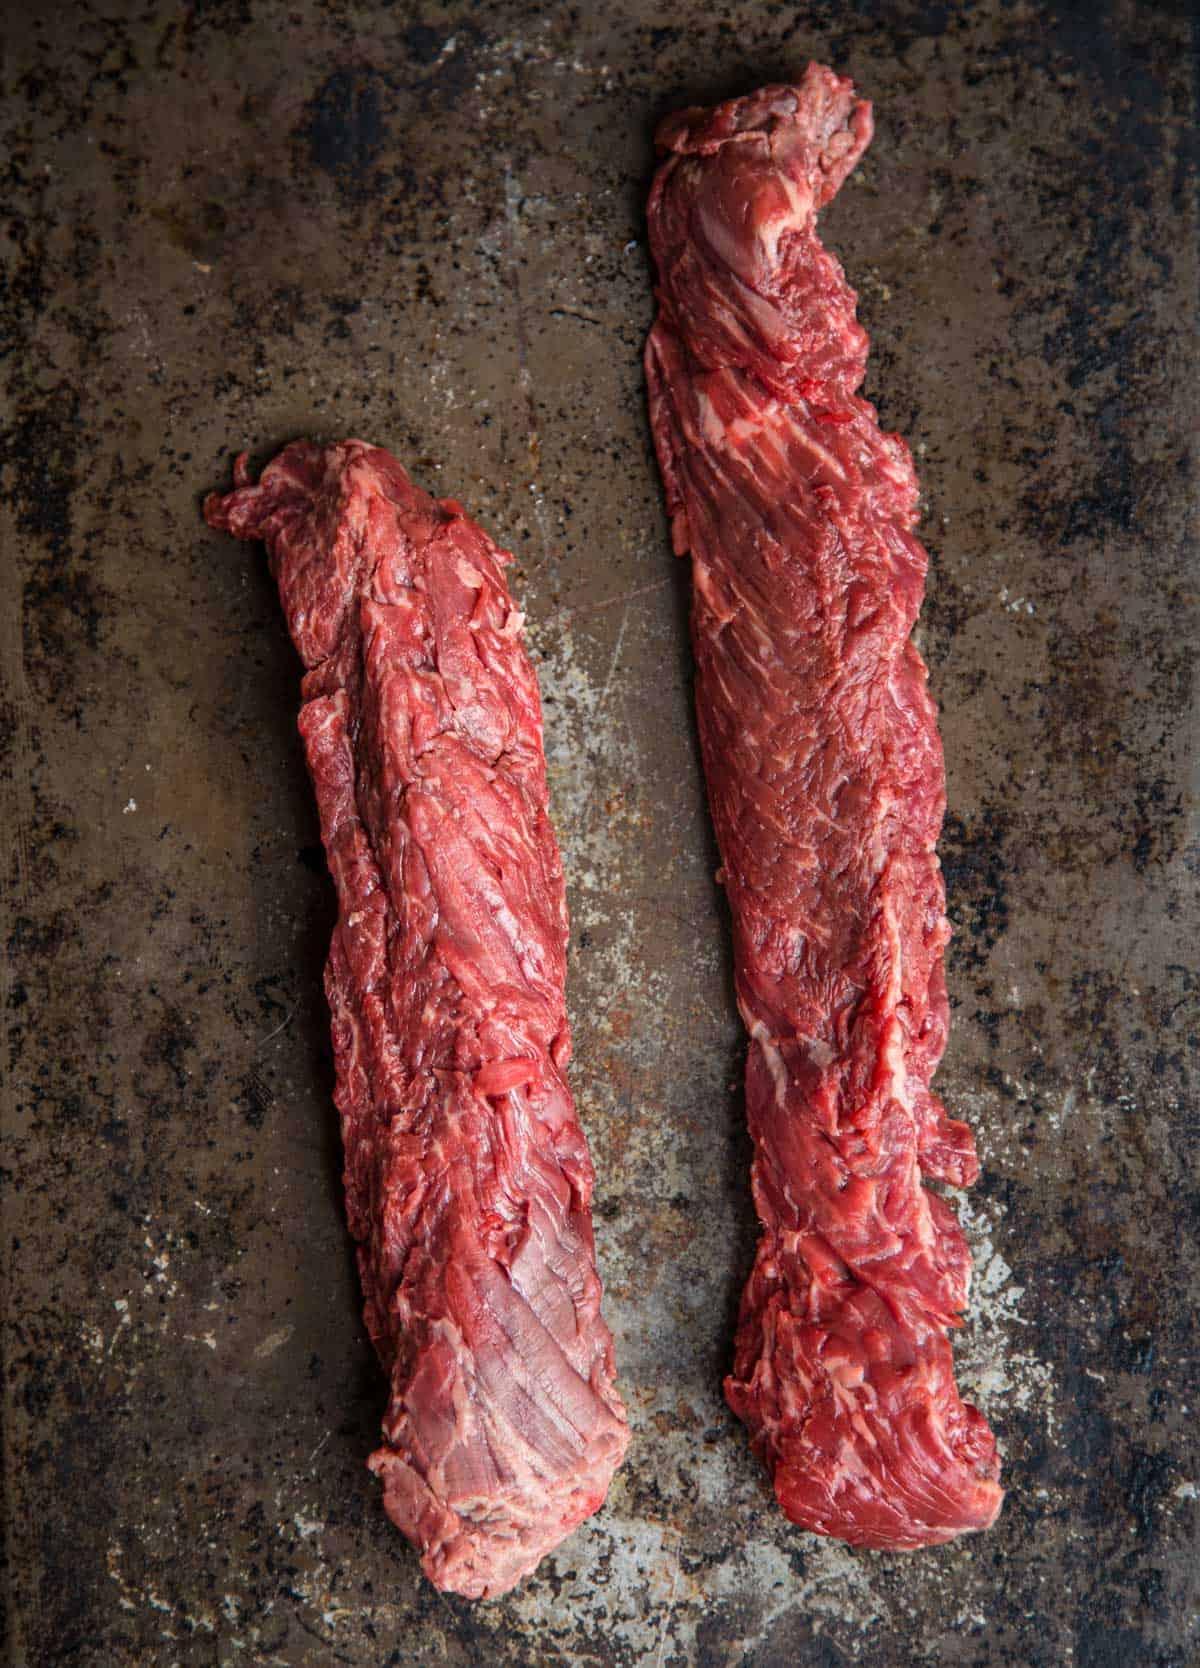 Two raw hanger steaks on a platter